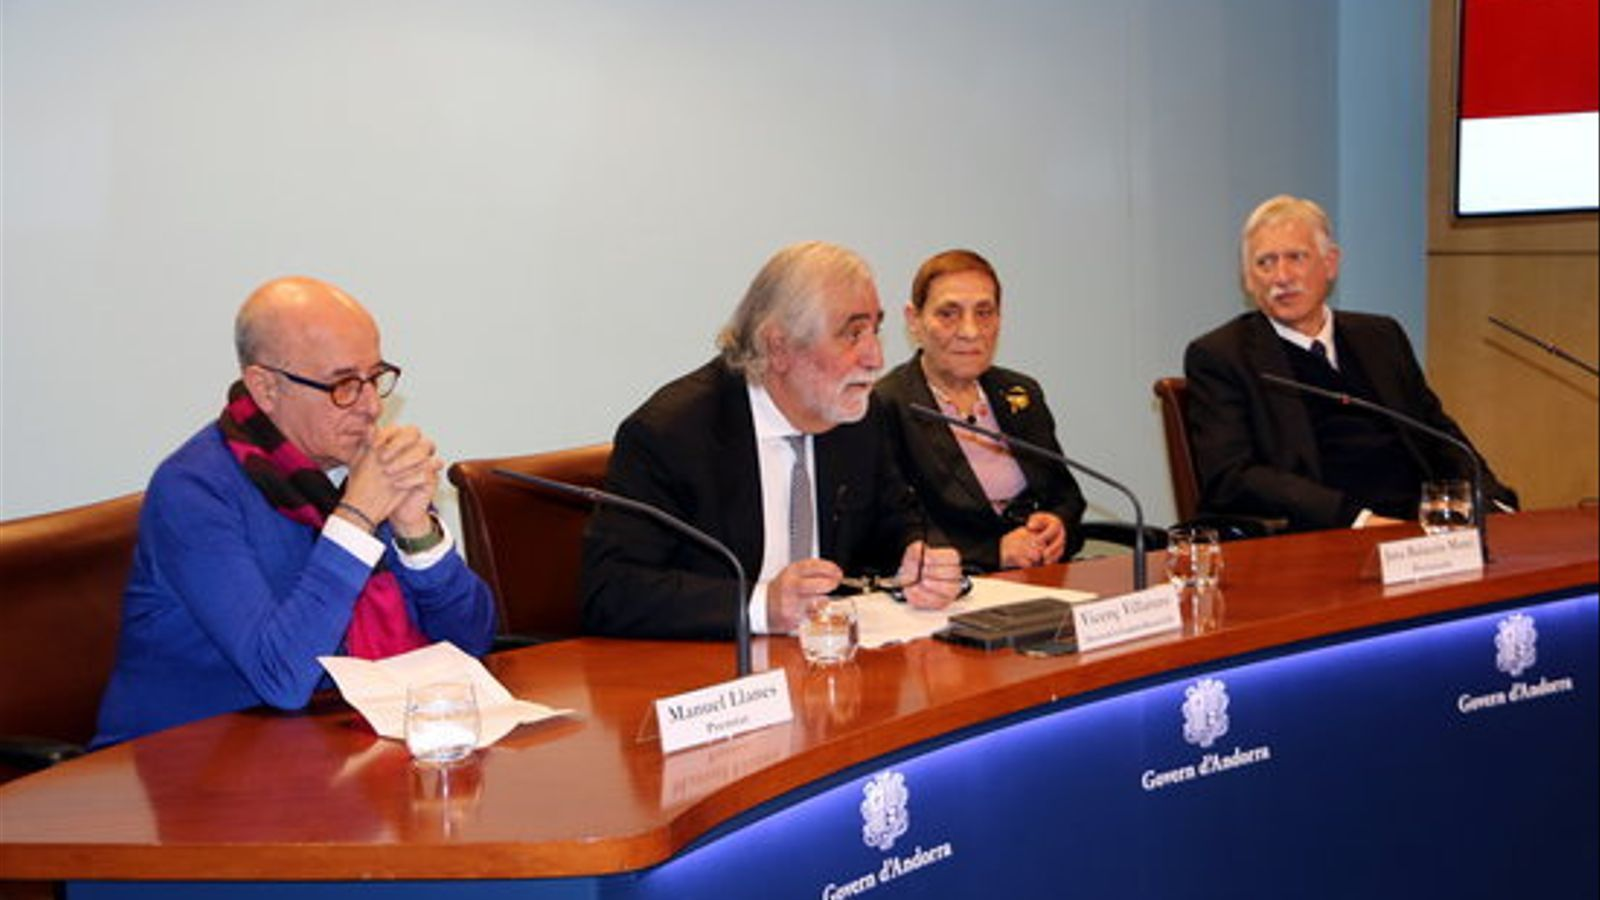 Manuel Llanes, Jana Balacciu i Jon Landaburu, amb Vicenç Villatoro, president de la Fundació Ramon Llull